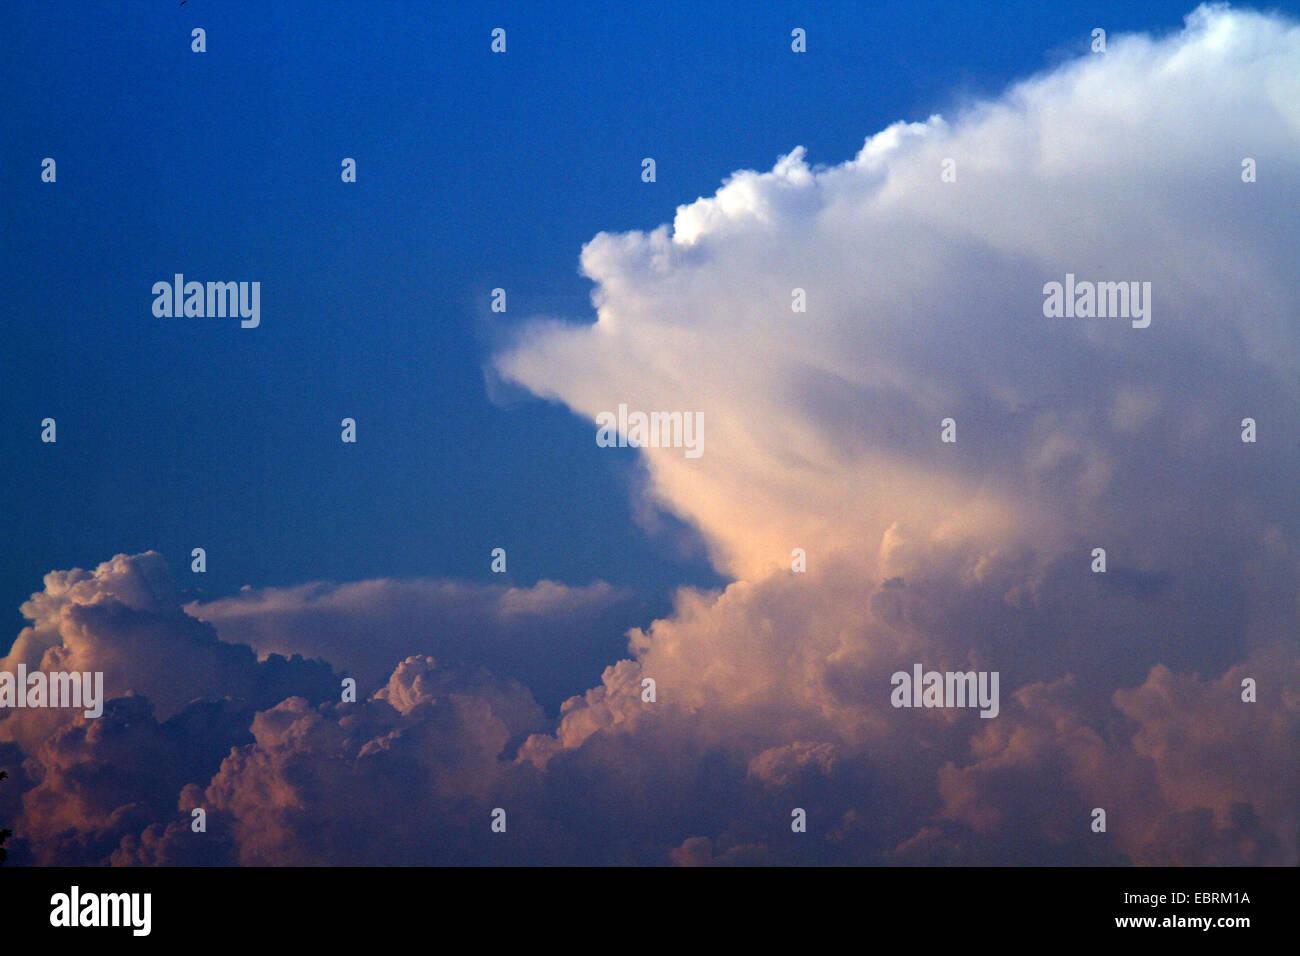 cumulonimbus clouds with incus, Germany - Stock Image